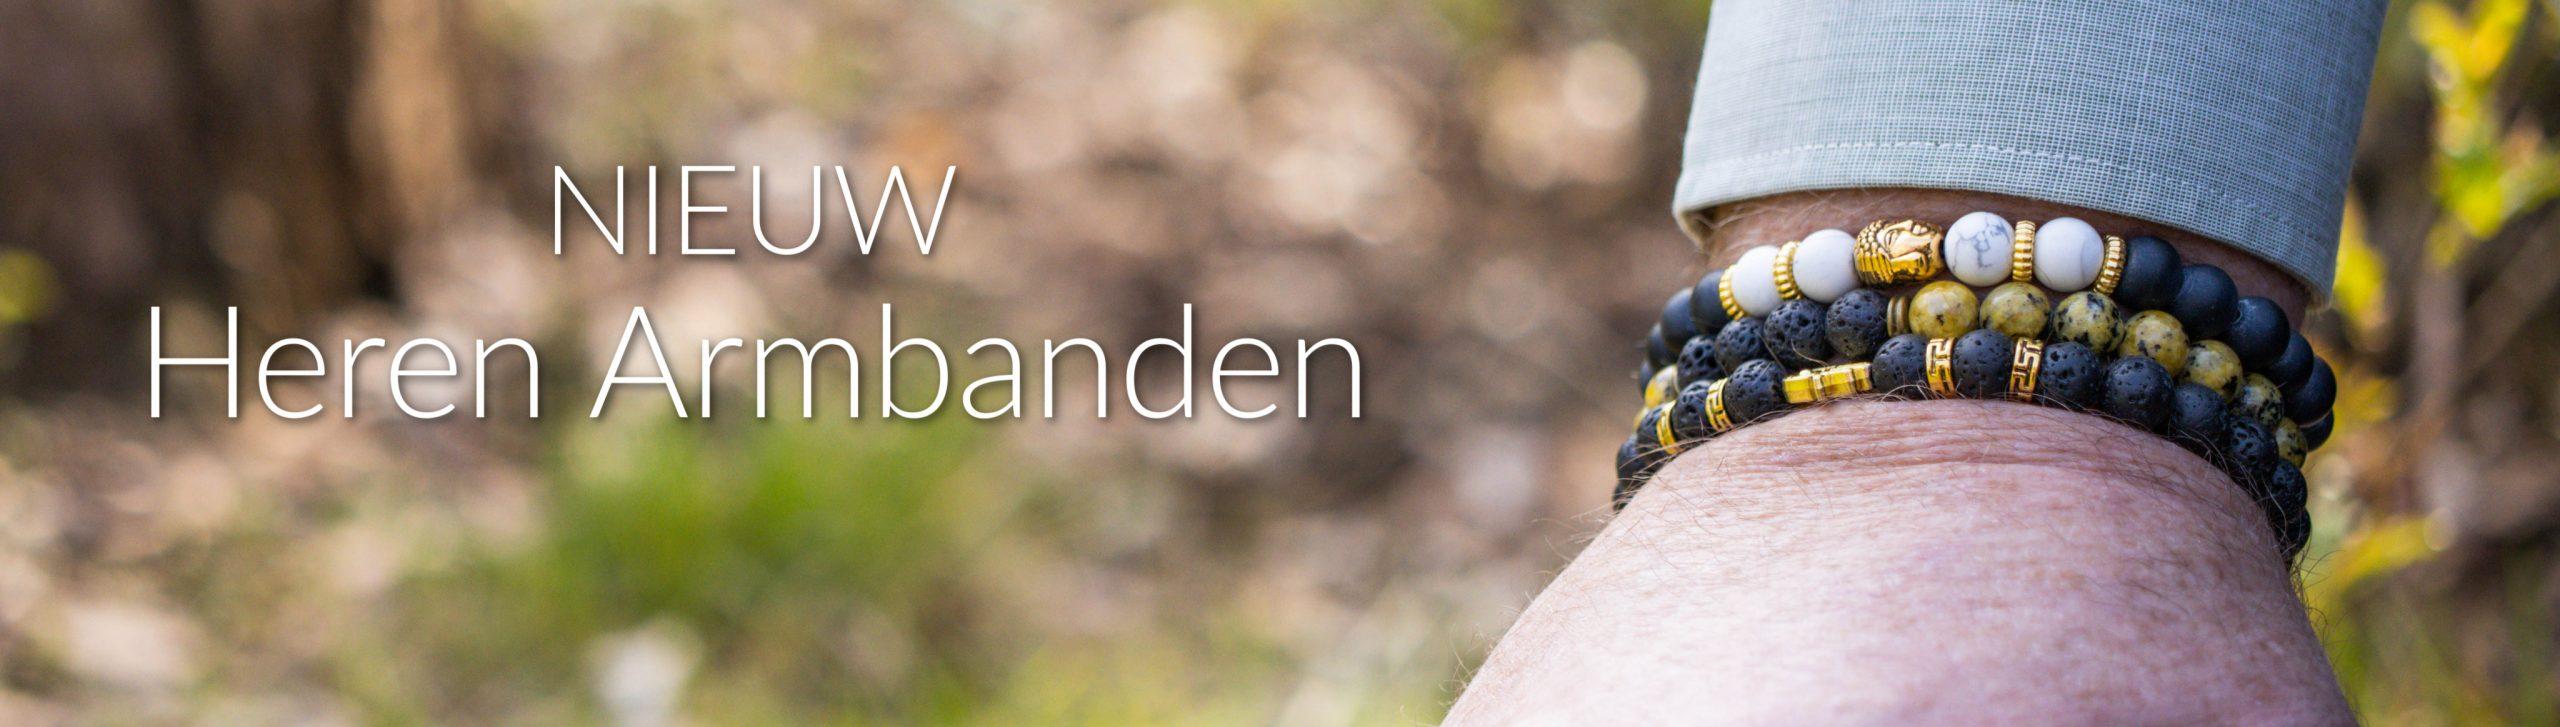 Heren Armbanden - banner